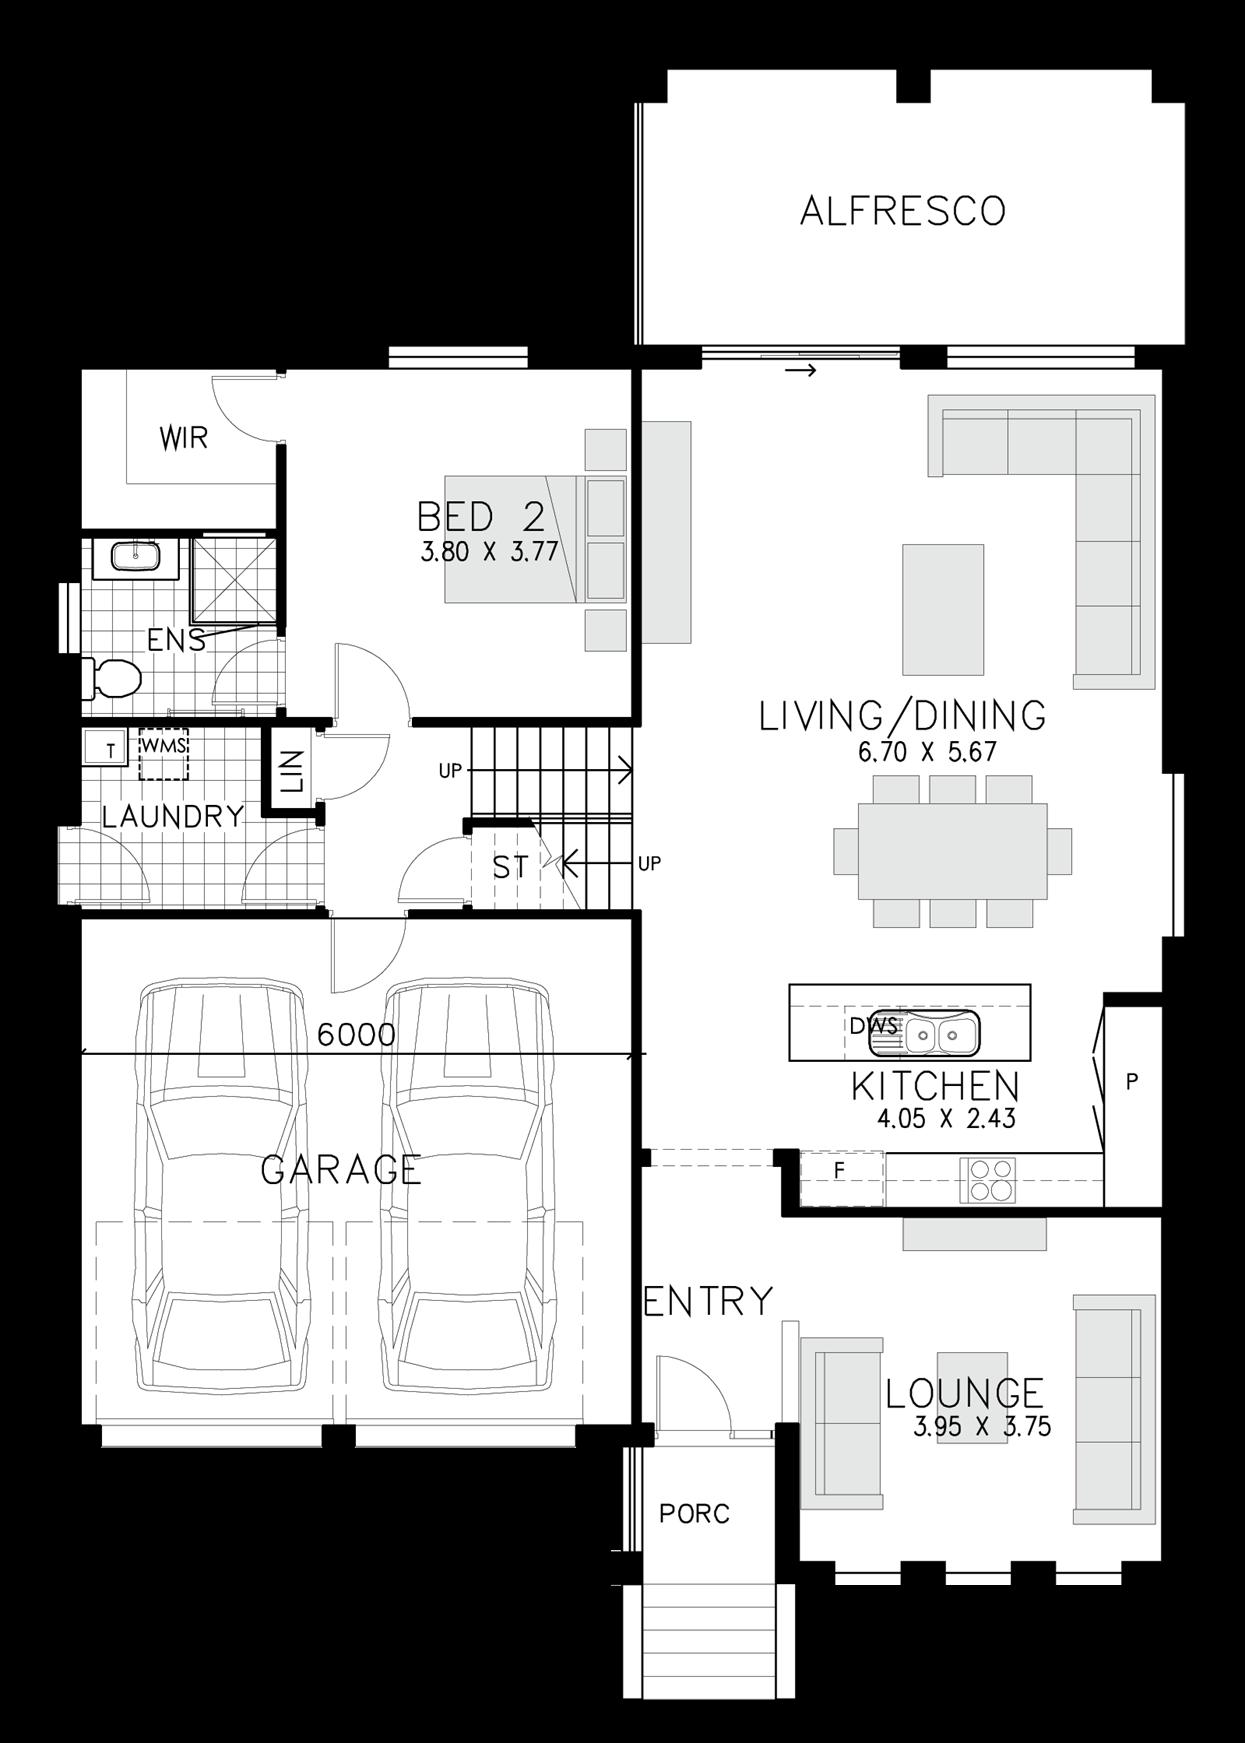 29 Split Entry Living Room Decorating Ideas Keep Home: 4 Bedroom Split Level